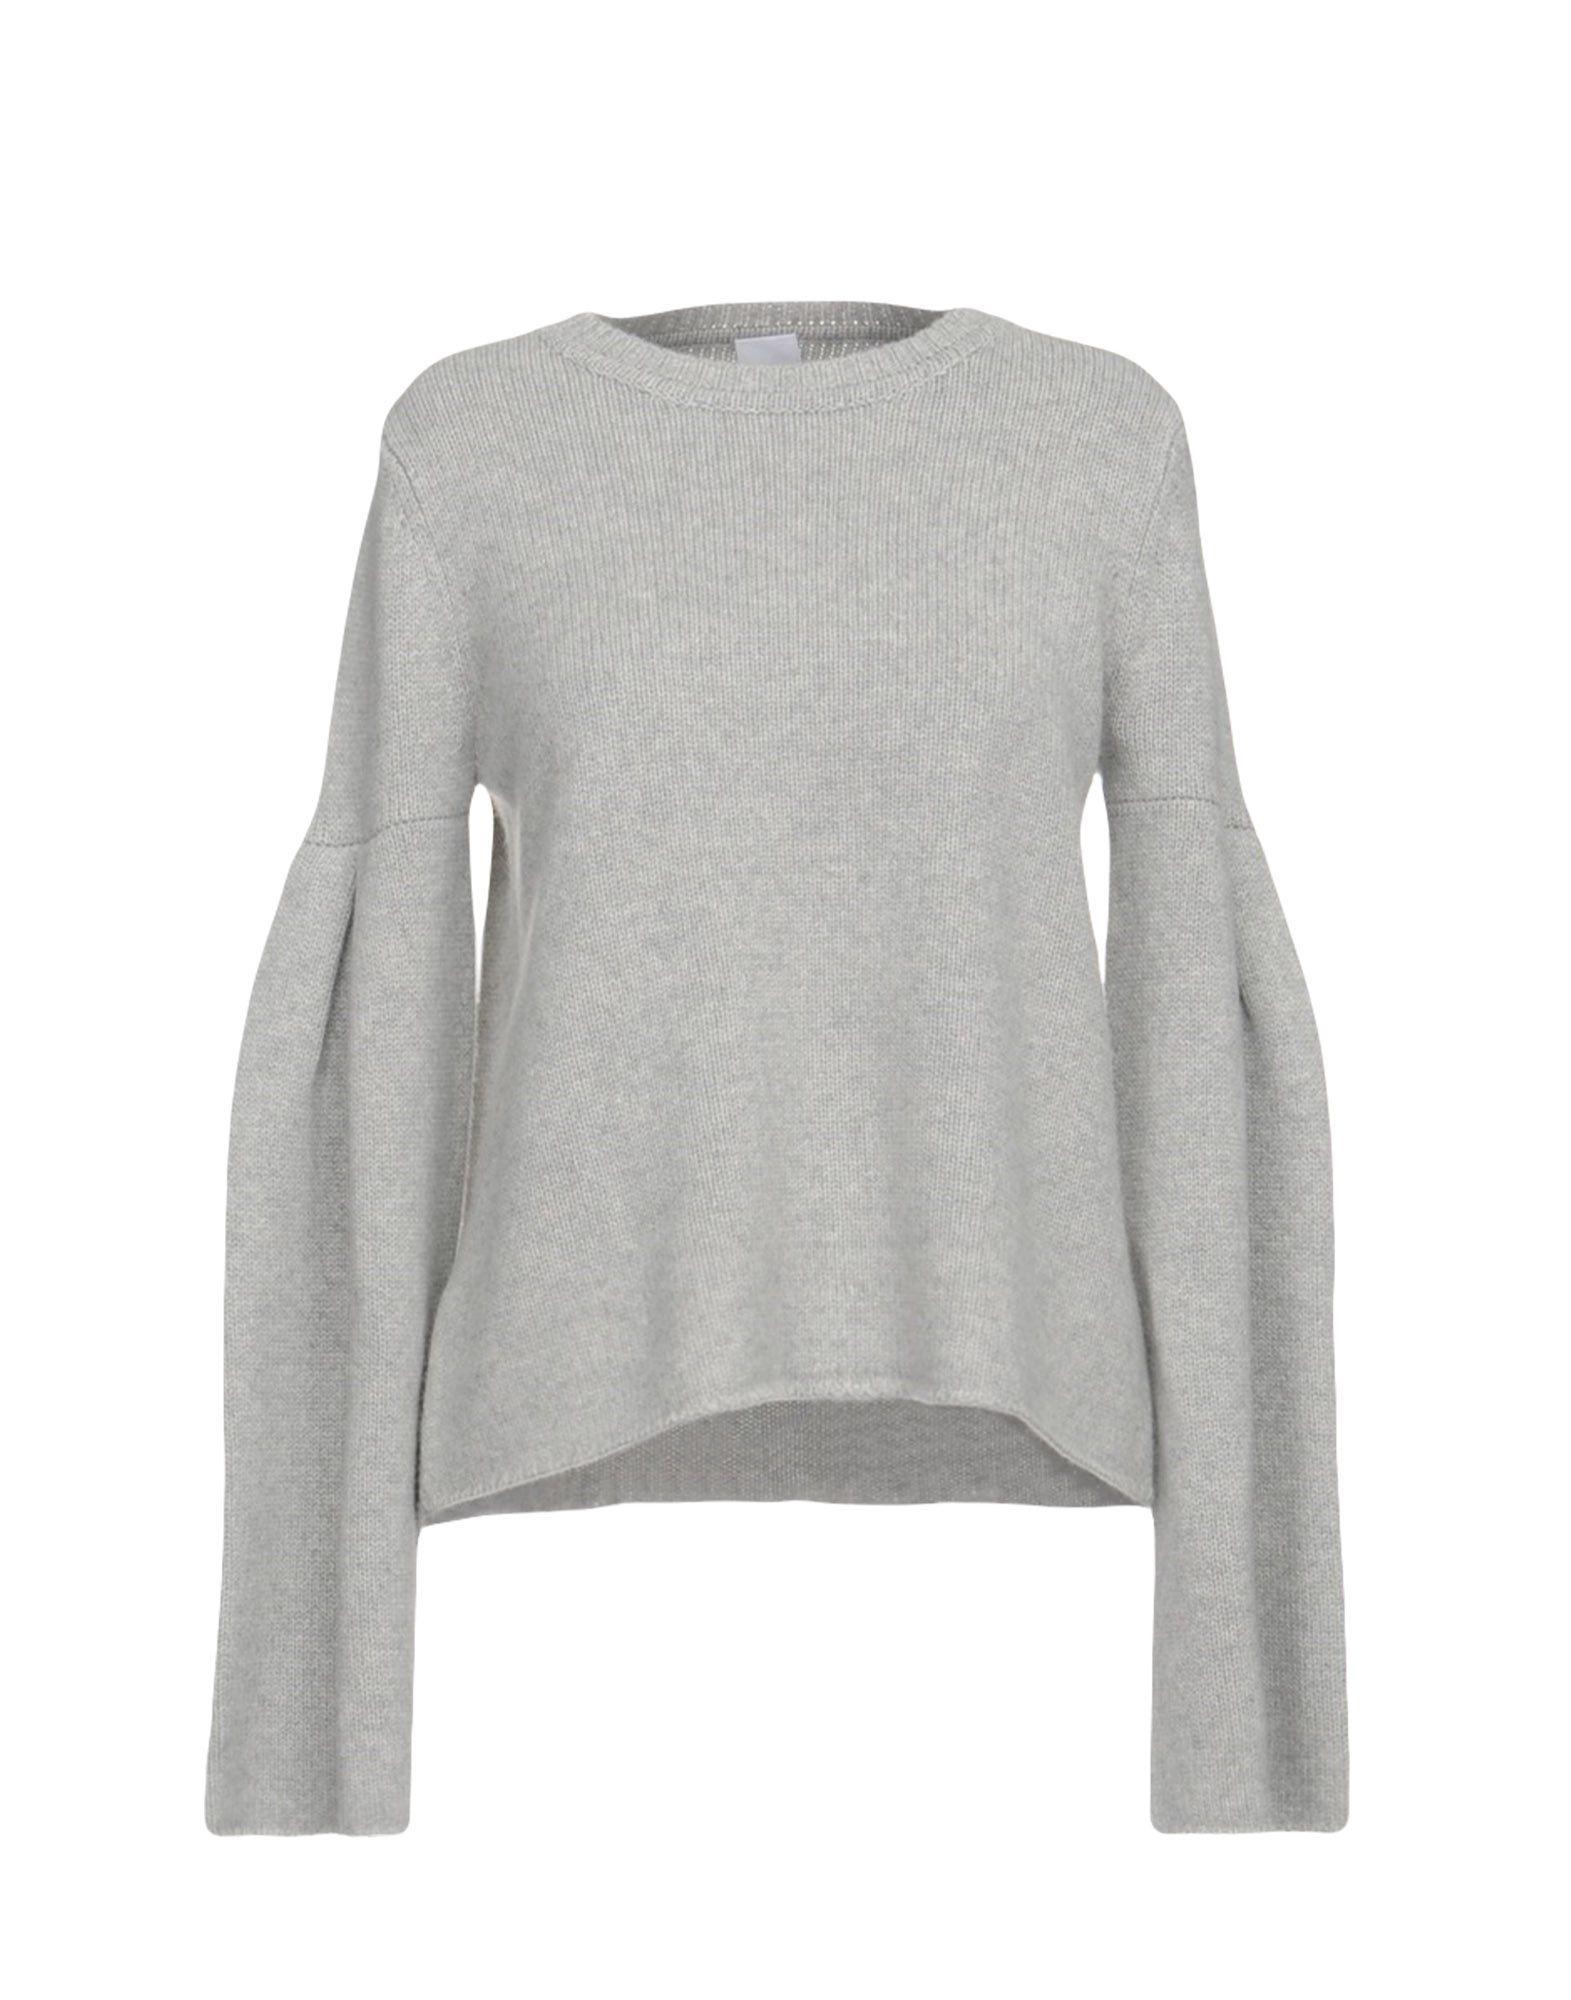 Iris & Ink Cashmere Blend In Light Grey